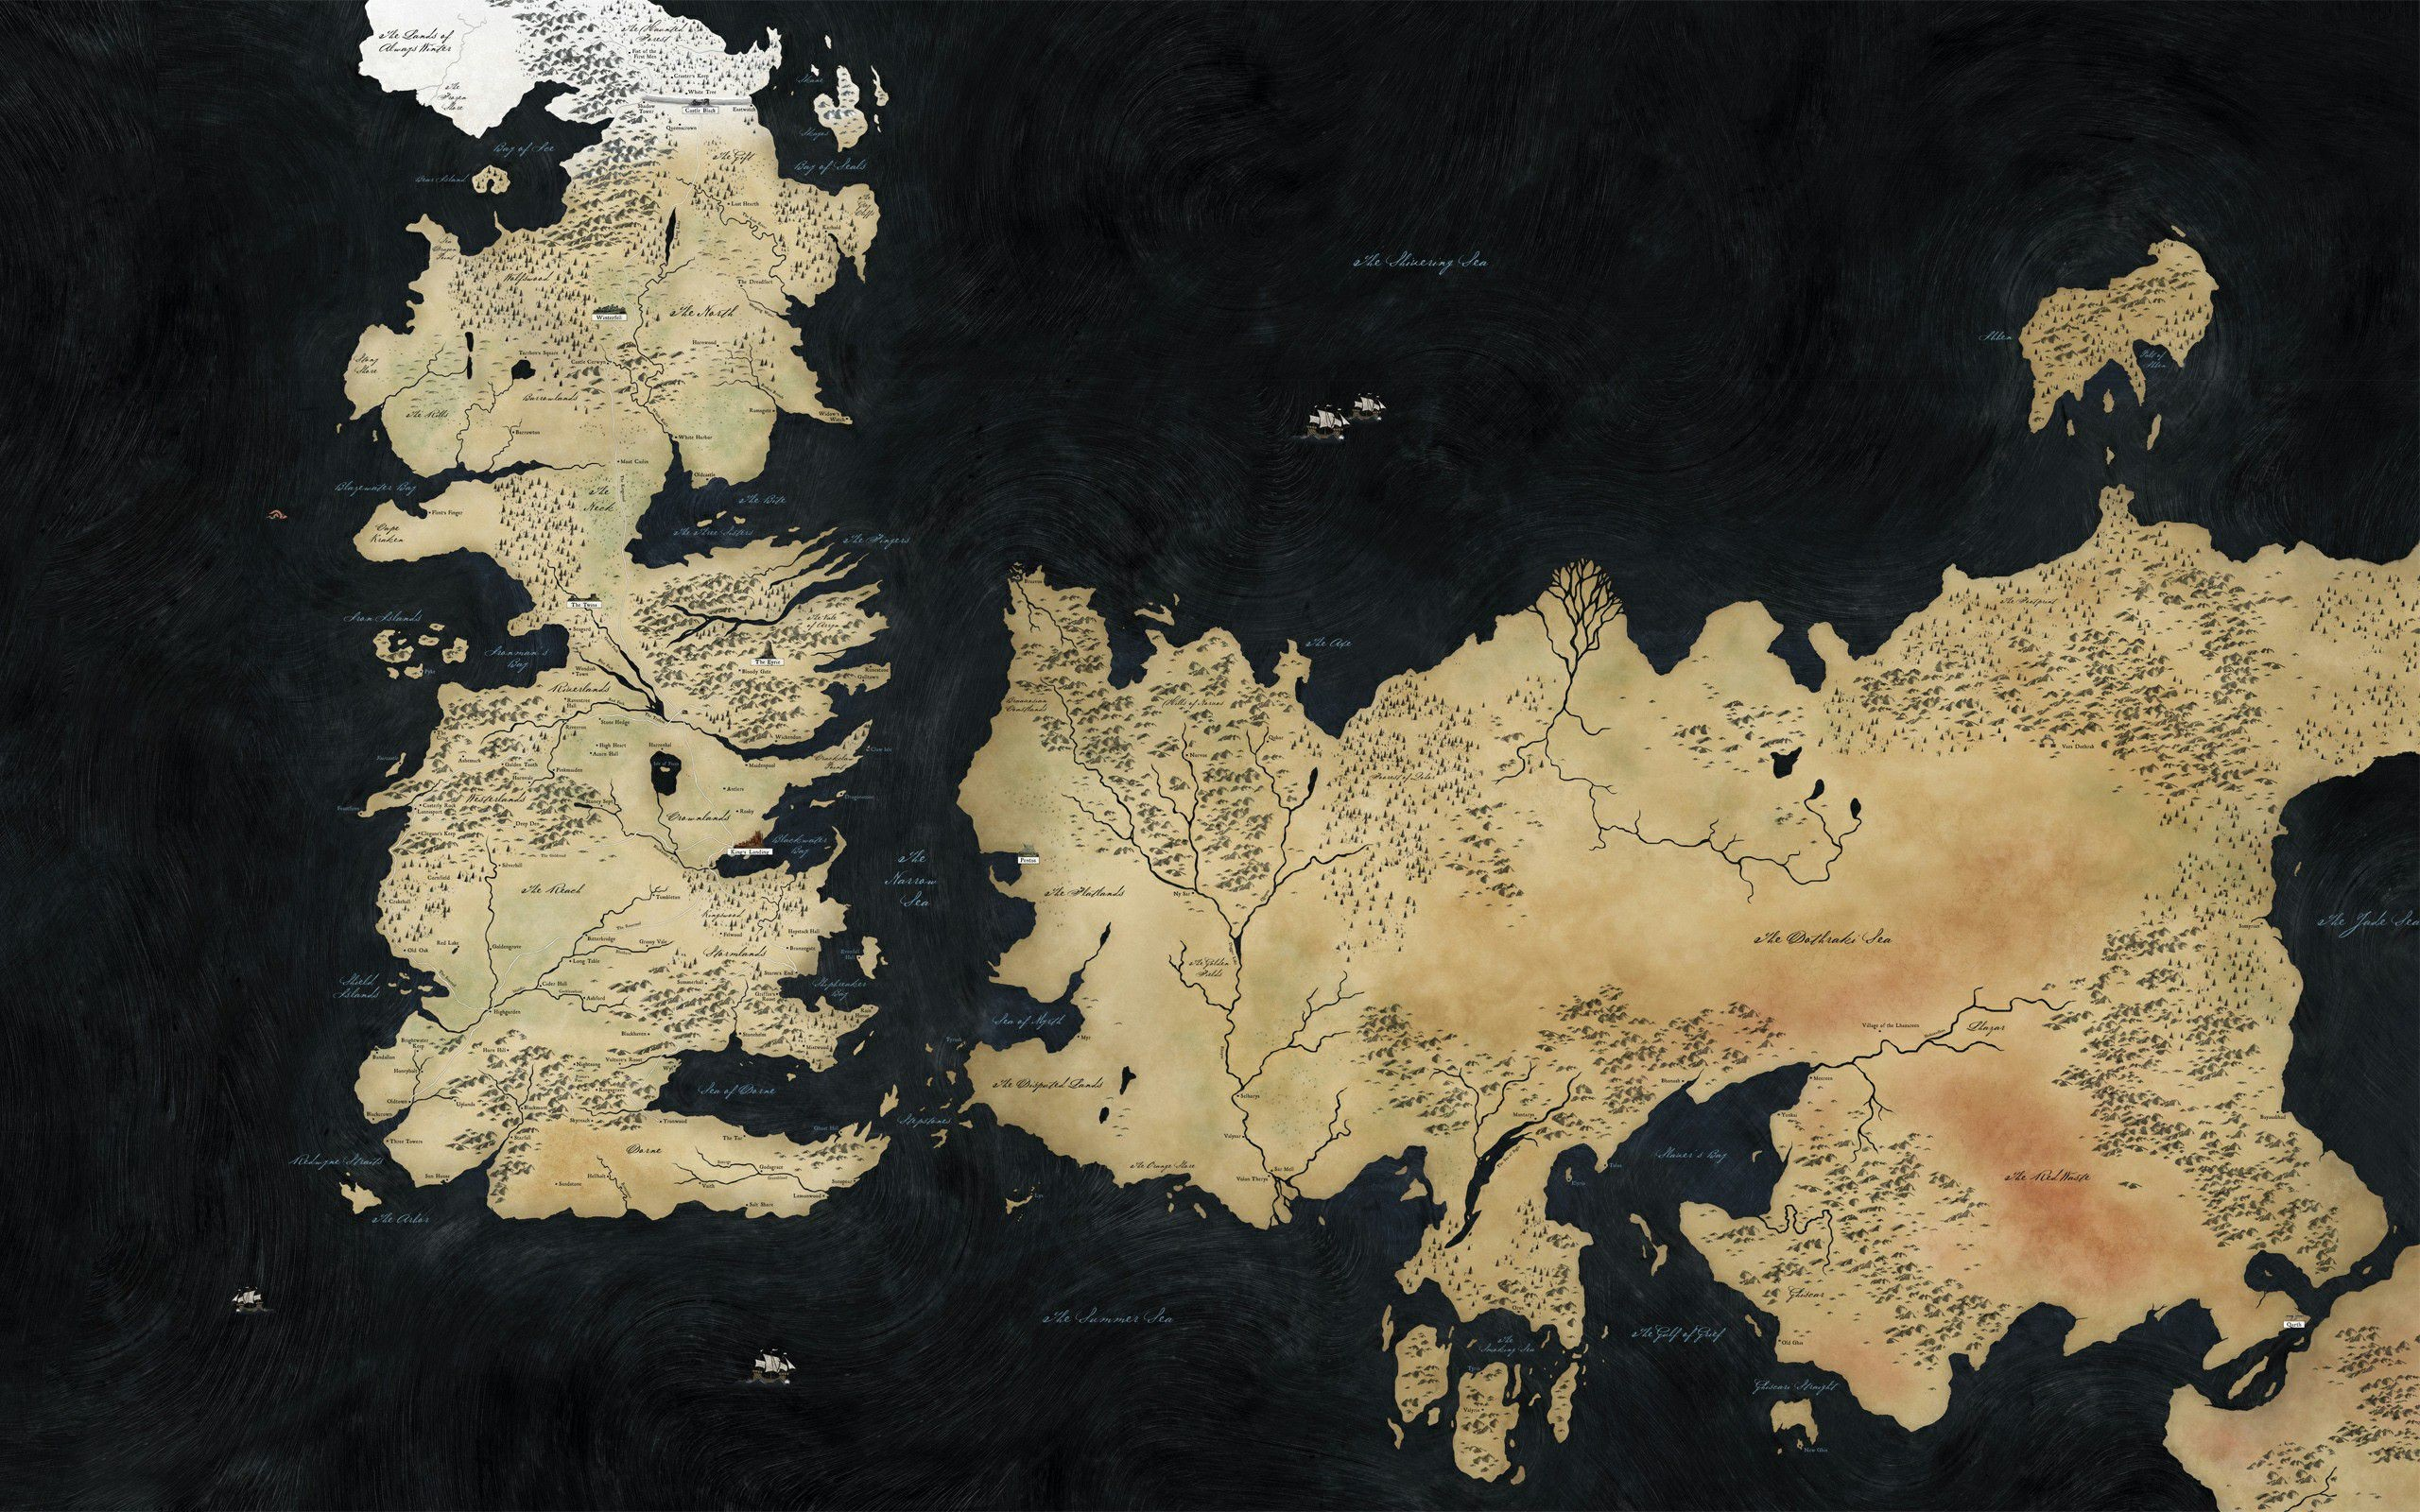 34 Game Of Thrones Maps Wallpapers On Wallpapersafari